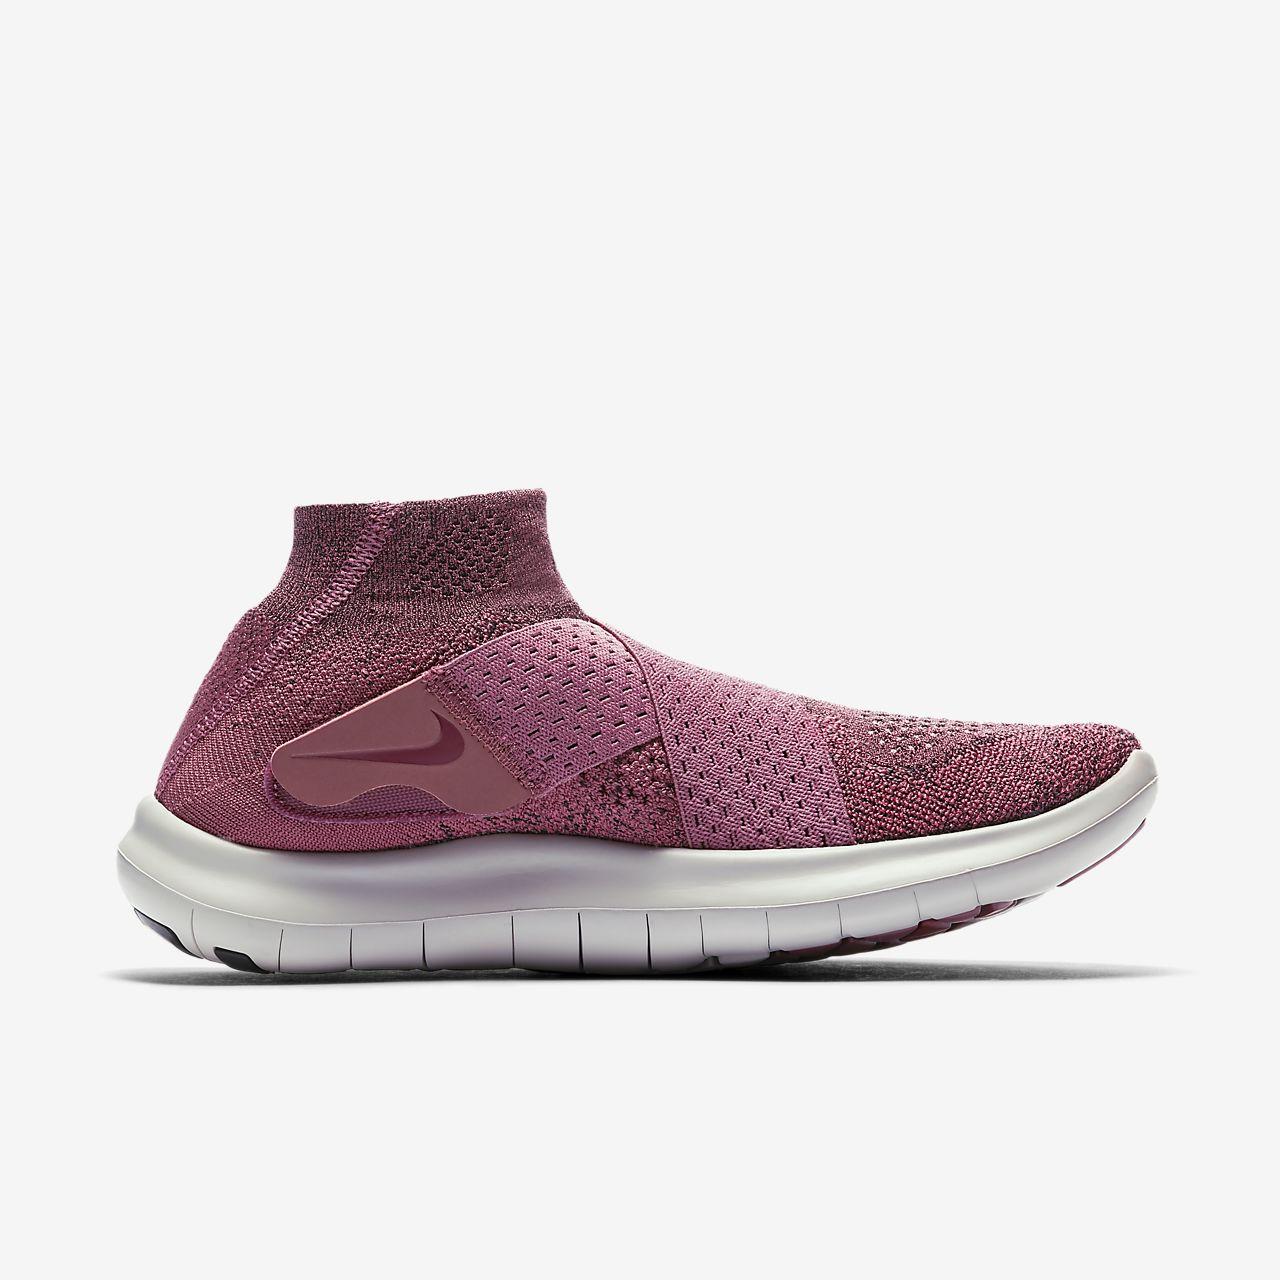 ... Nike Free RN Motion Flyknit 2017 Damen-Laufschuh